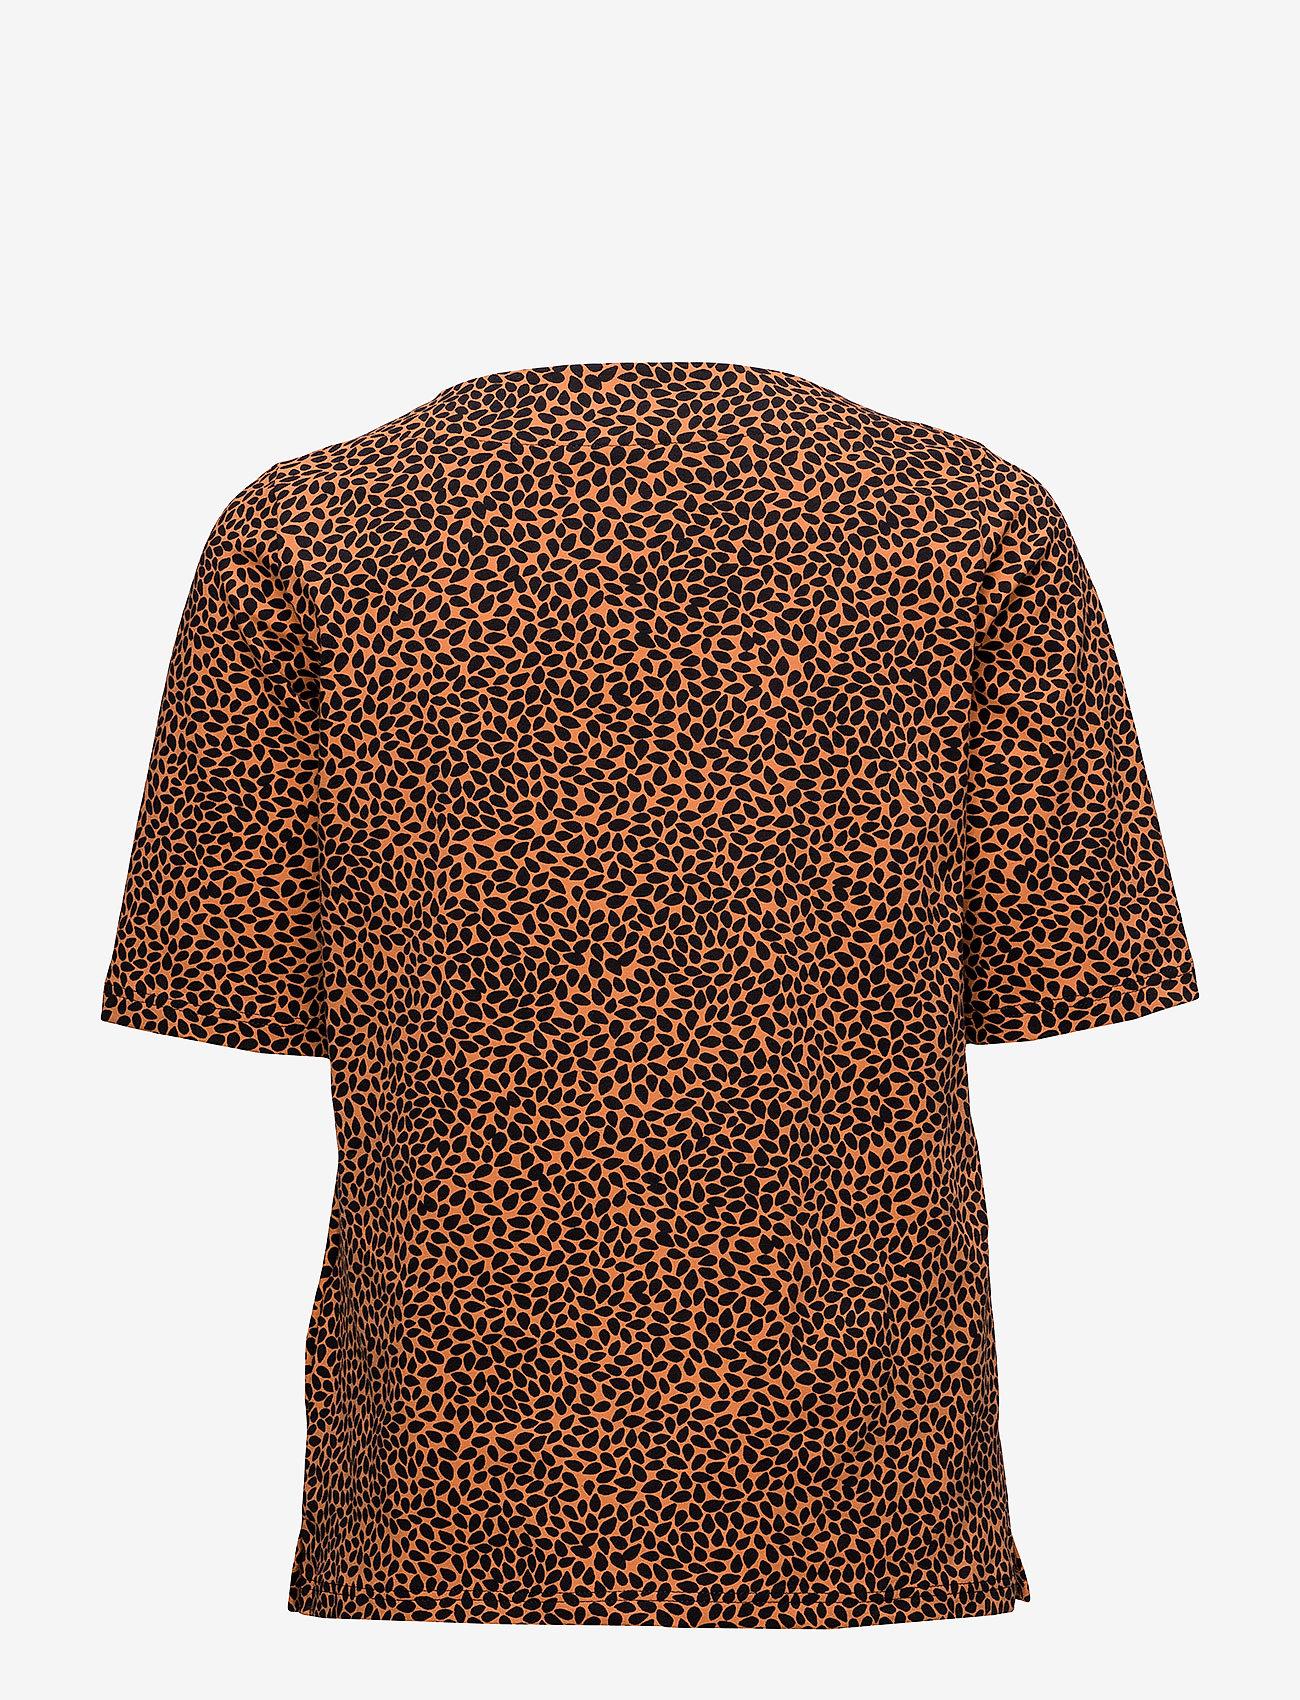 Nanso - Ladies shirt, Sesam - t-shirts - orange - 1